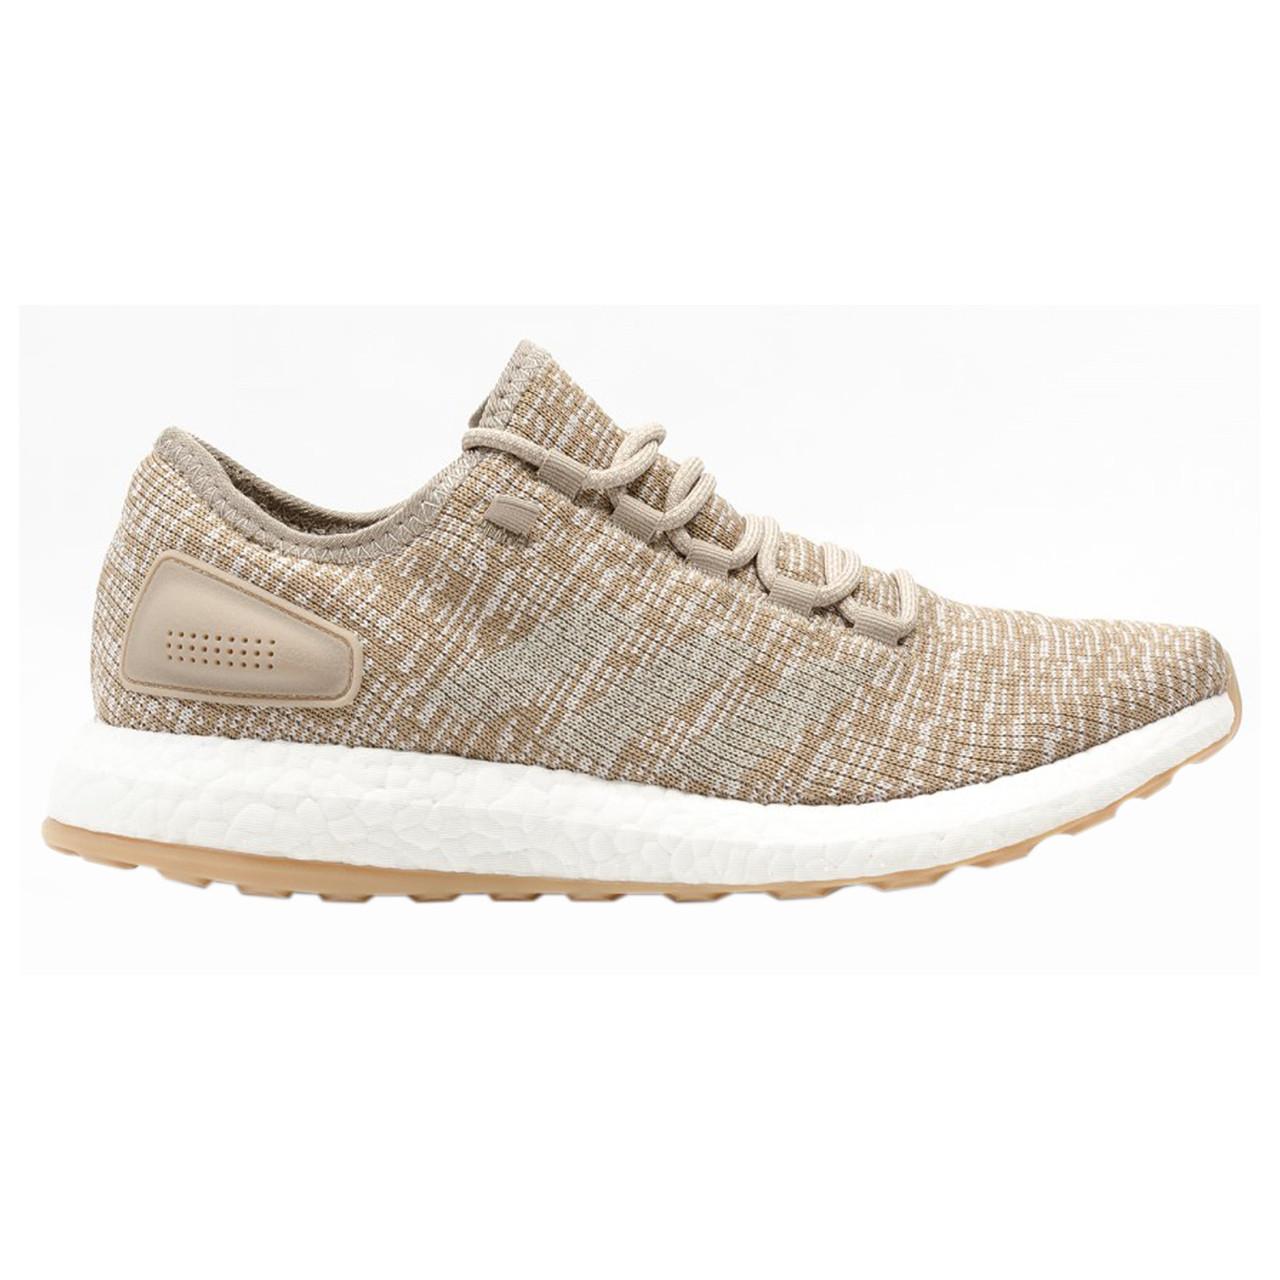 90324b2e4 Adidas PureBOOST Mens Sneakers S81992 - Khaki